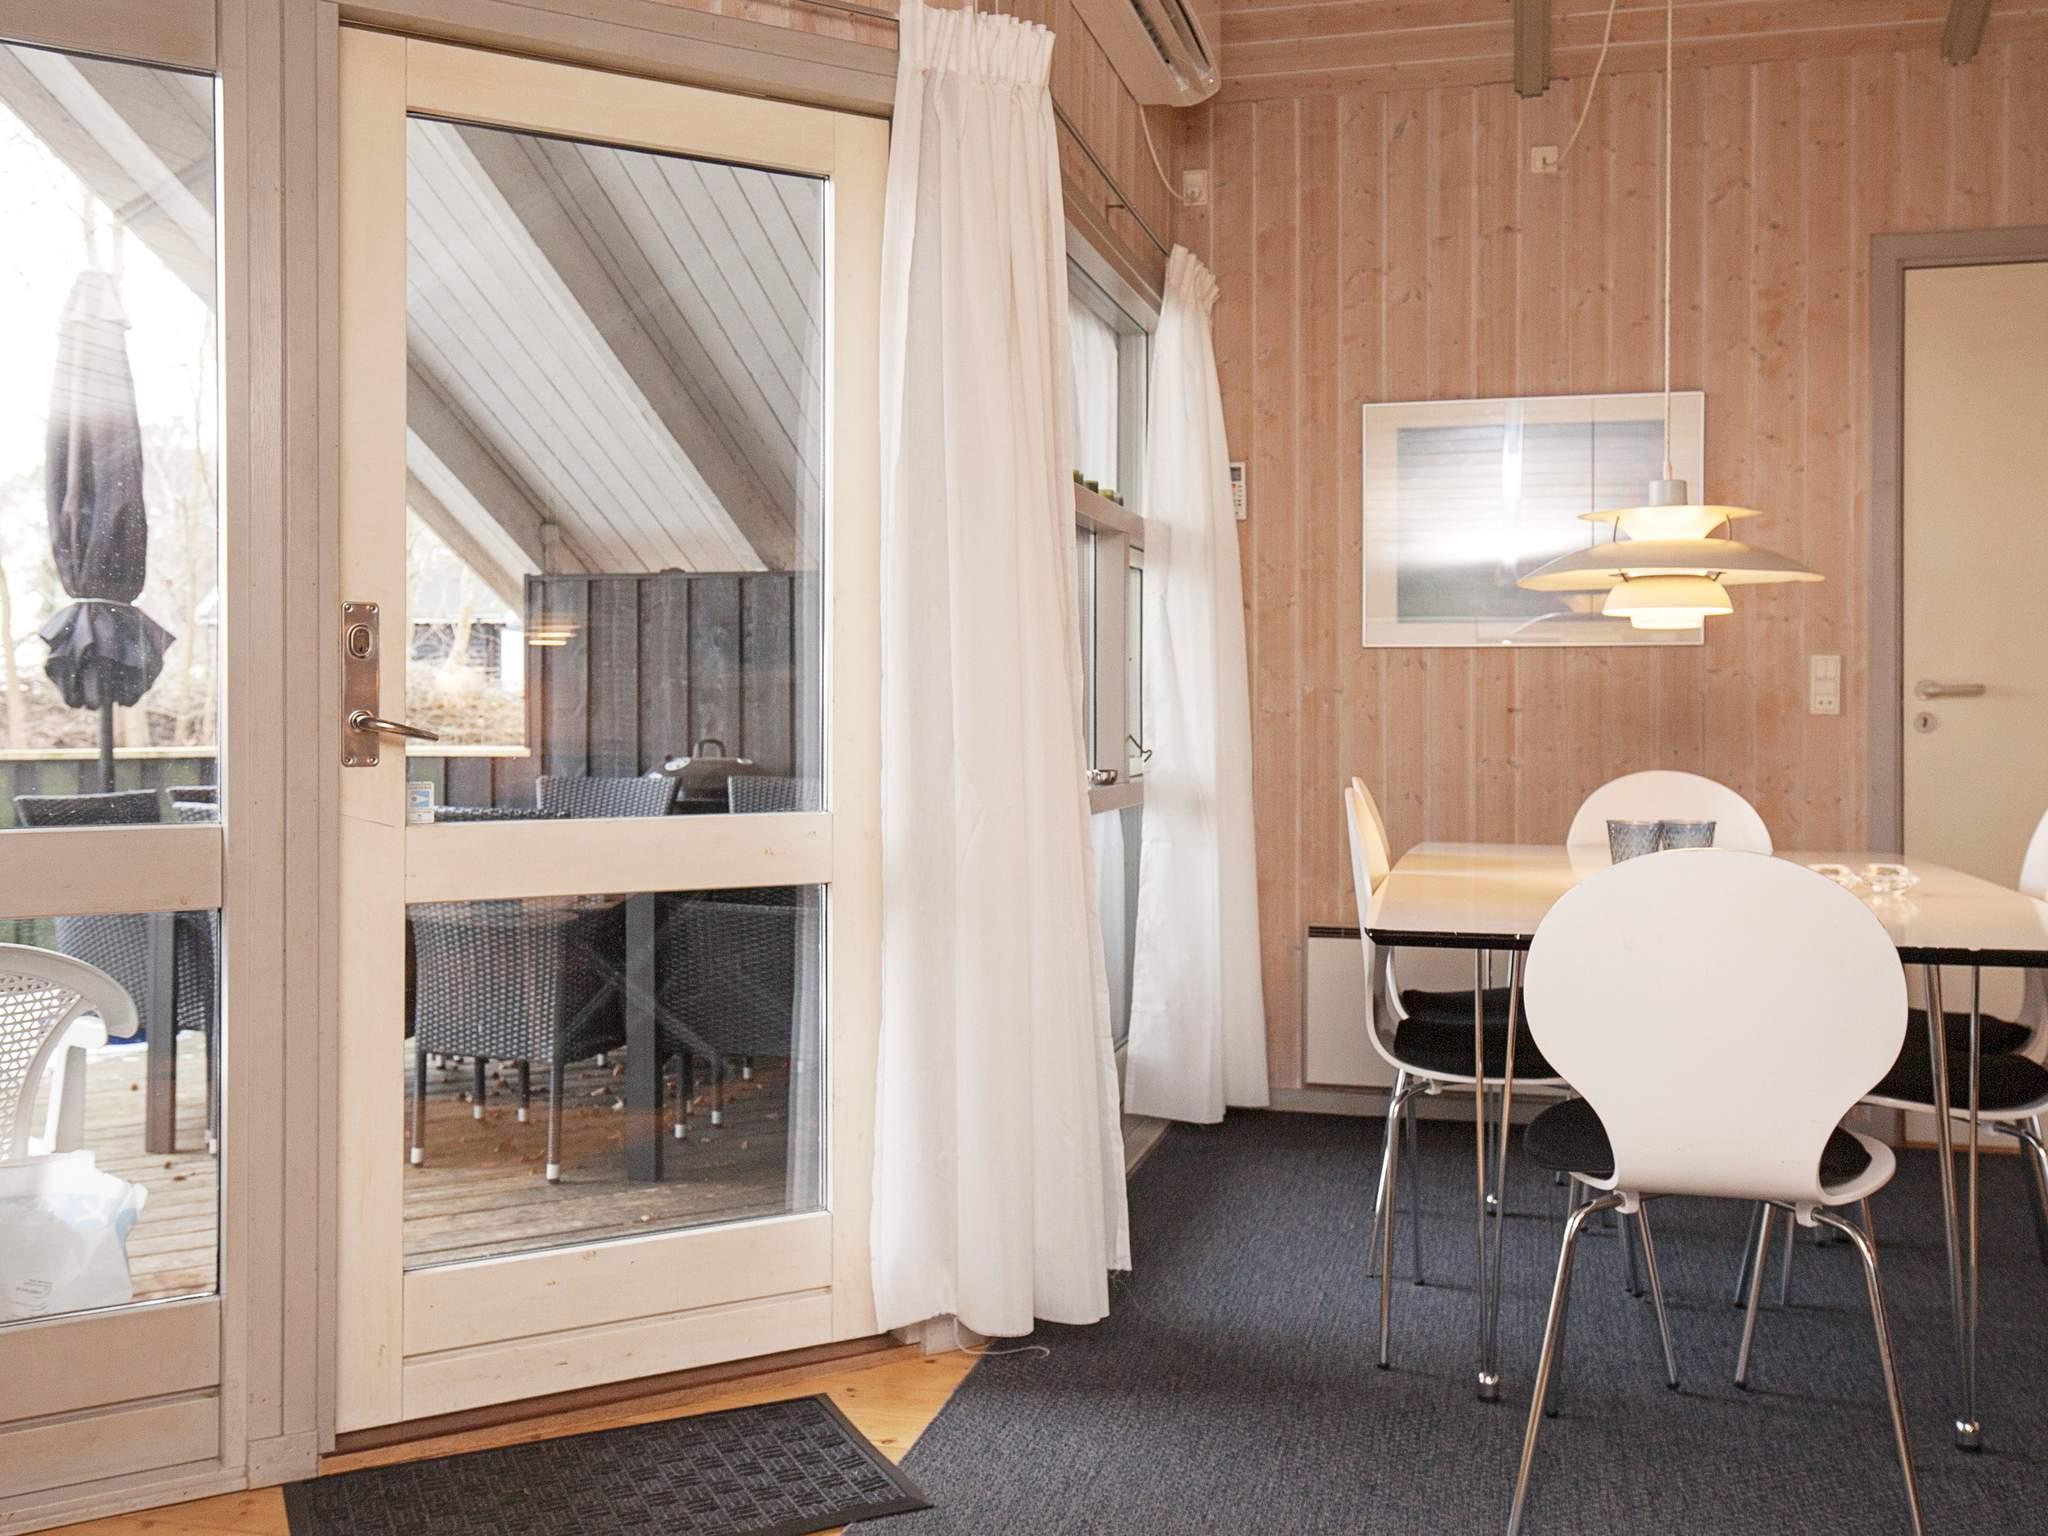 Ferienhaus Melby (83177), Melby, , Nordseeland, Dänemark, Bild 5